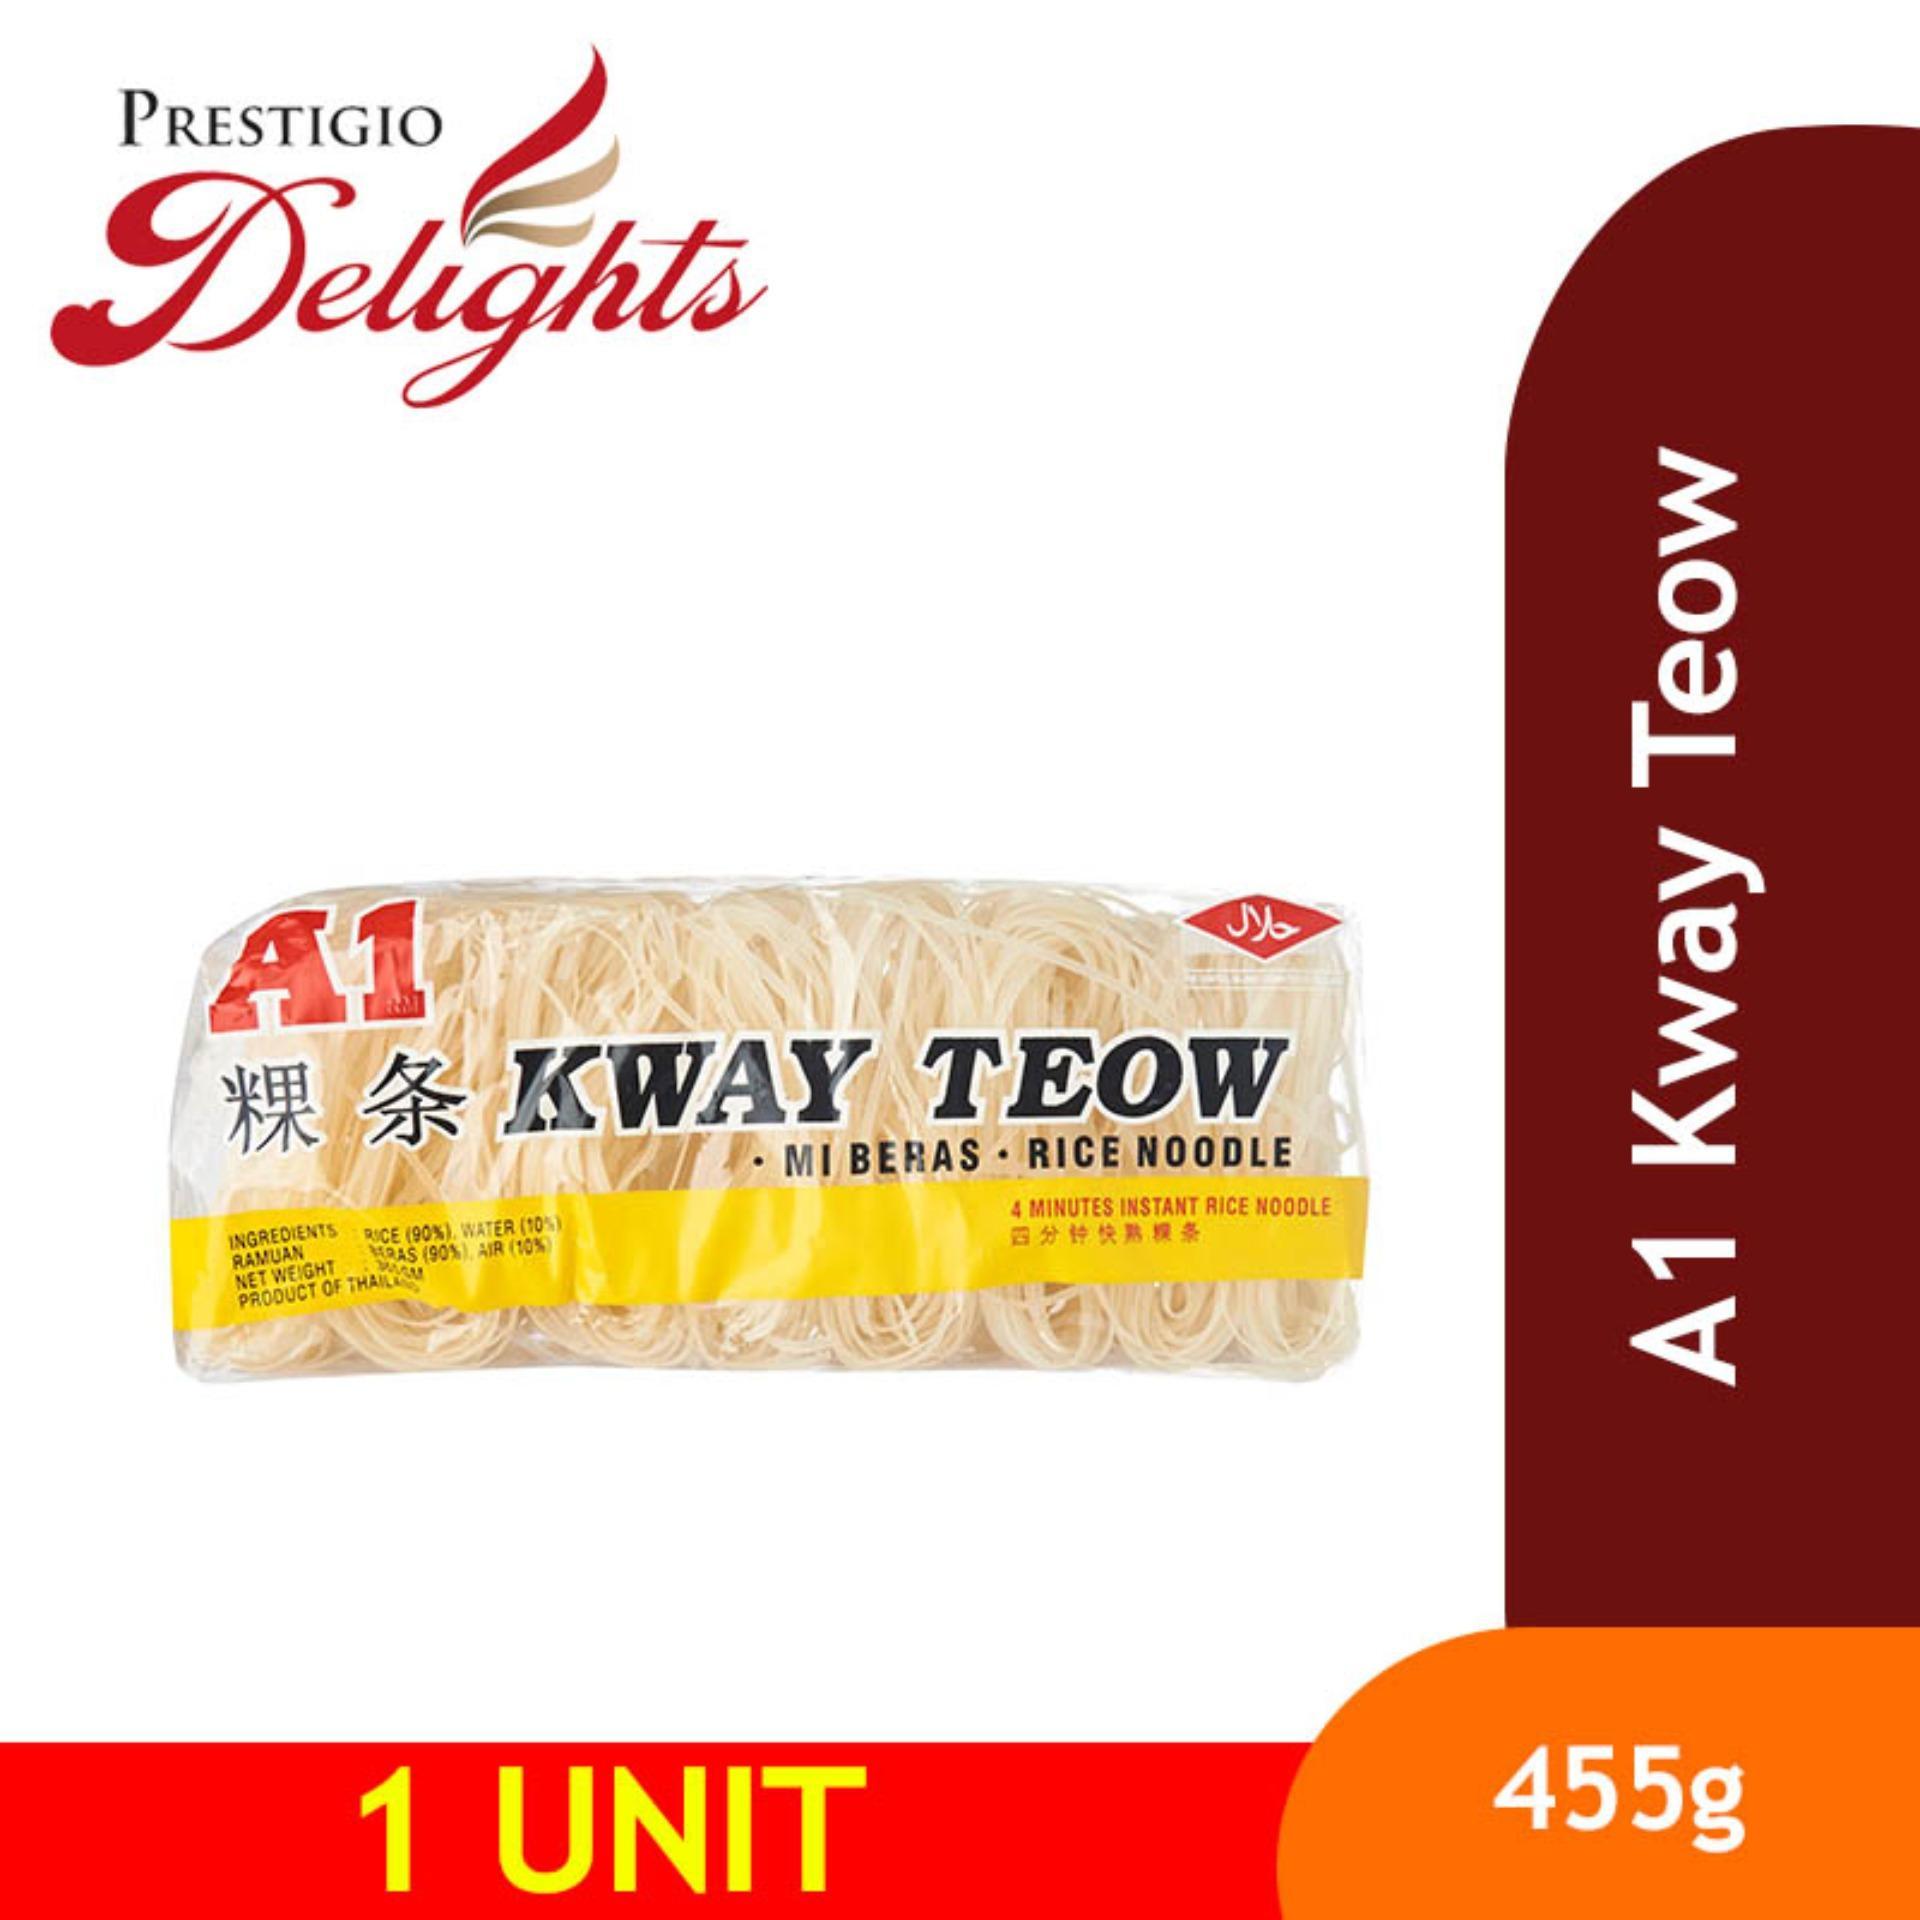 A1 Kway Teow 455g By Prestigio Delights.